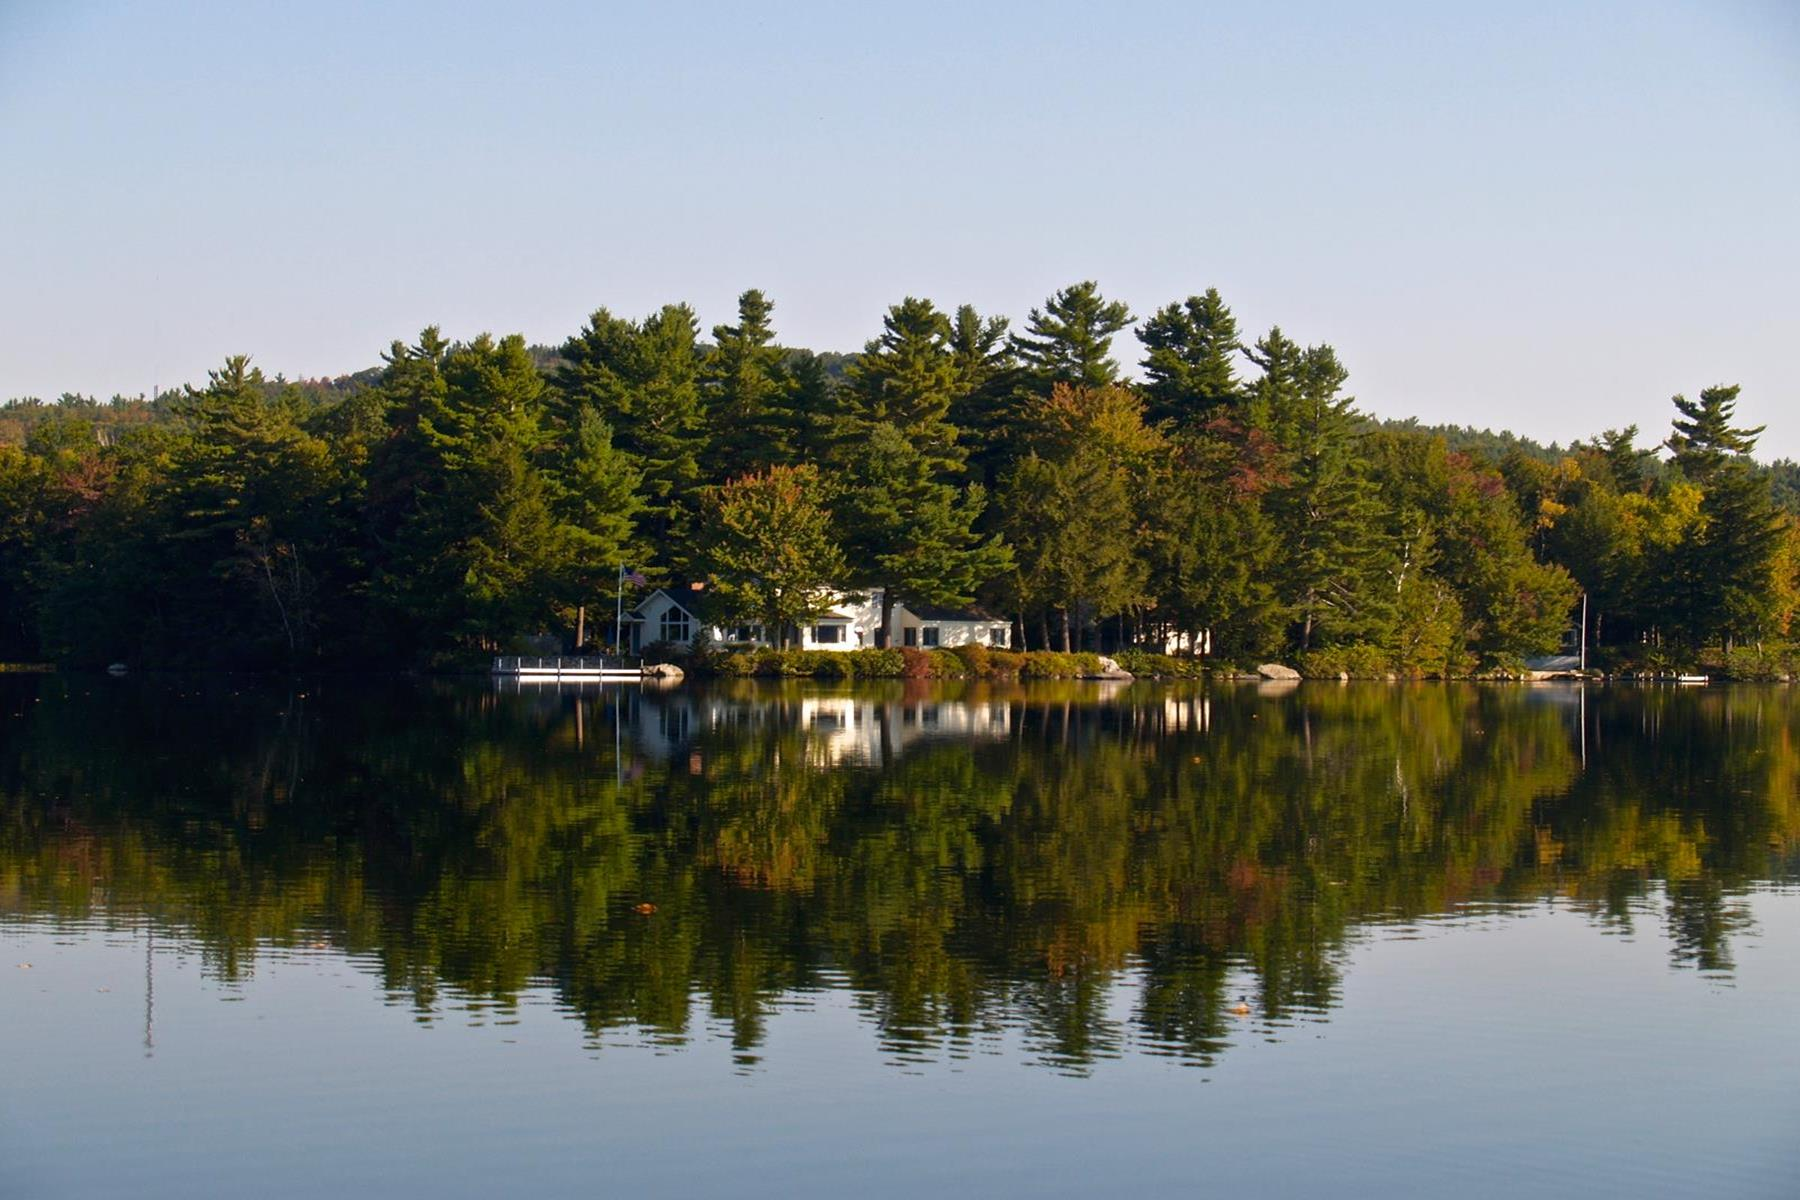 Villa per Vendita alle ore 43 Woody Point, New London 43 Woody Pt New London, New Hampshire 03257 Stati Uniti